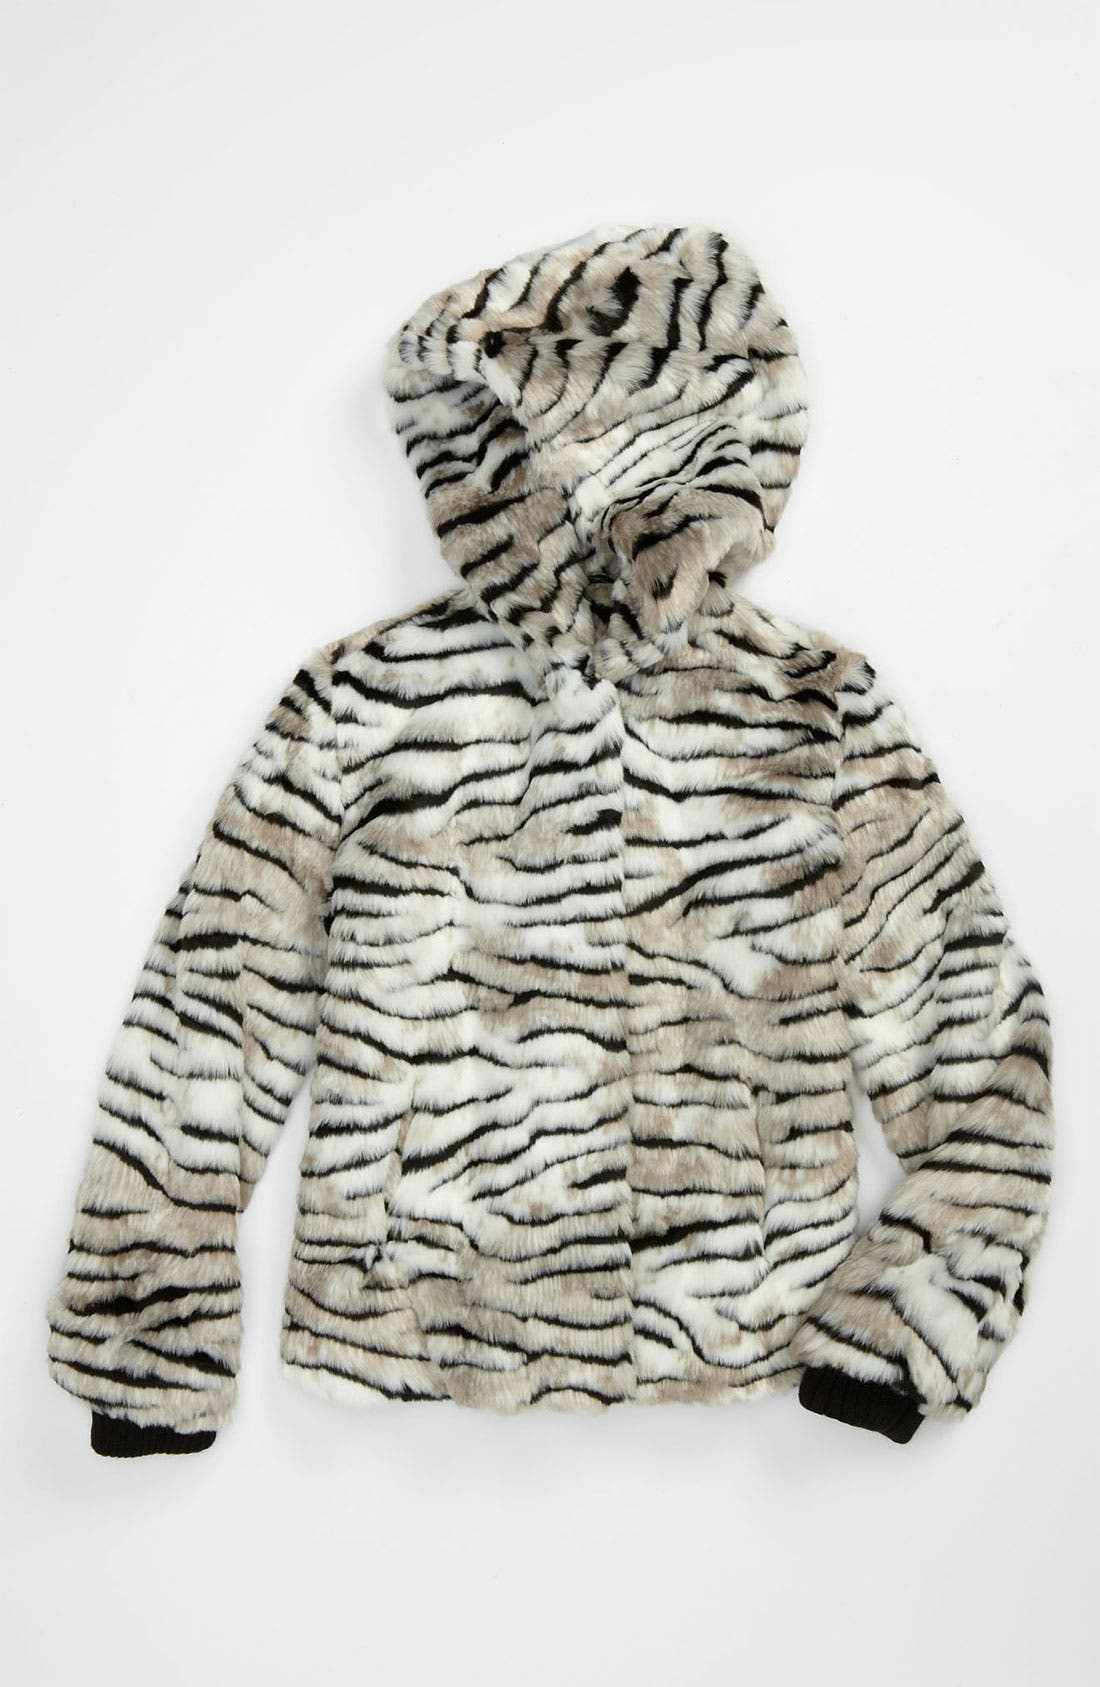 Alternate Image 1 Selected - Juicy Couture Faux Fur Jacket (Little Girls & Big Girls)